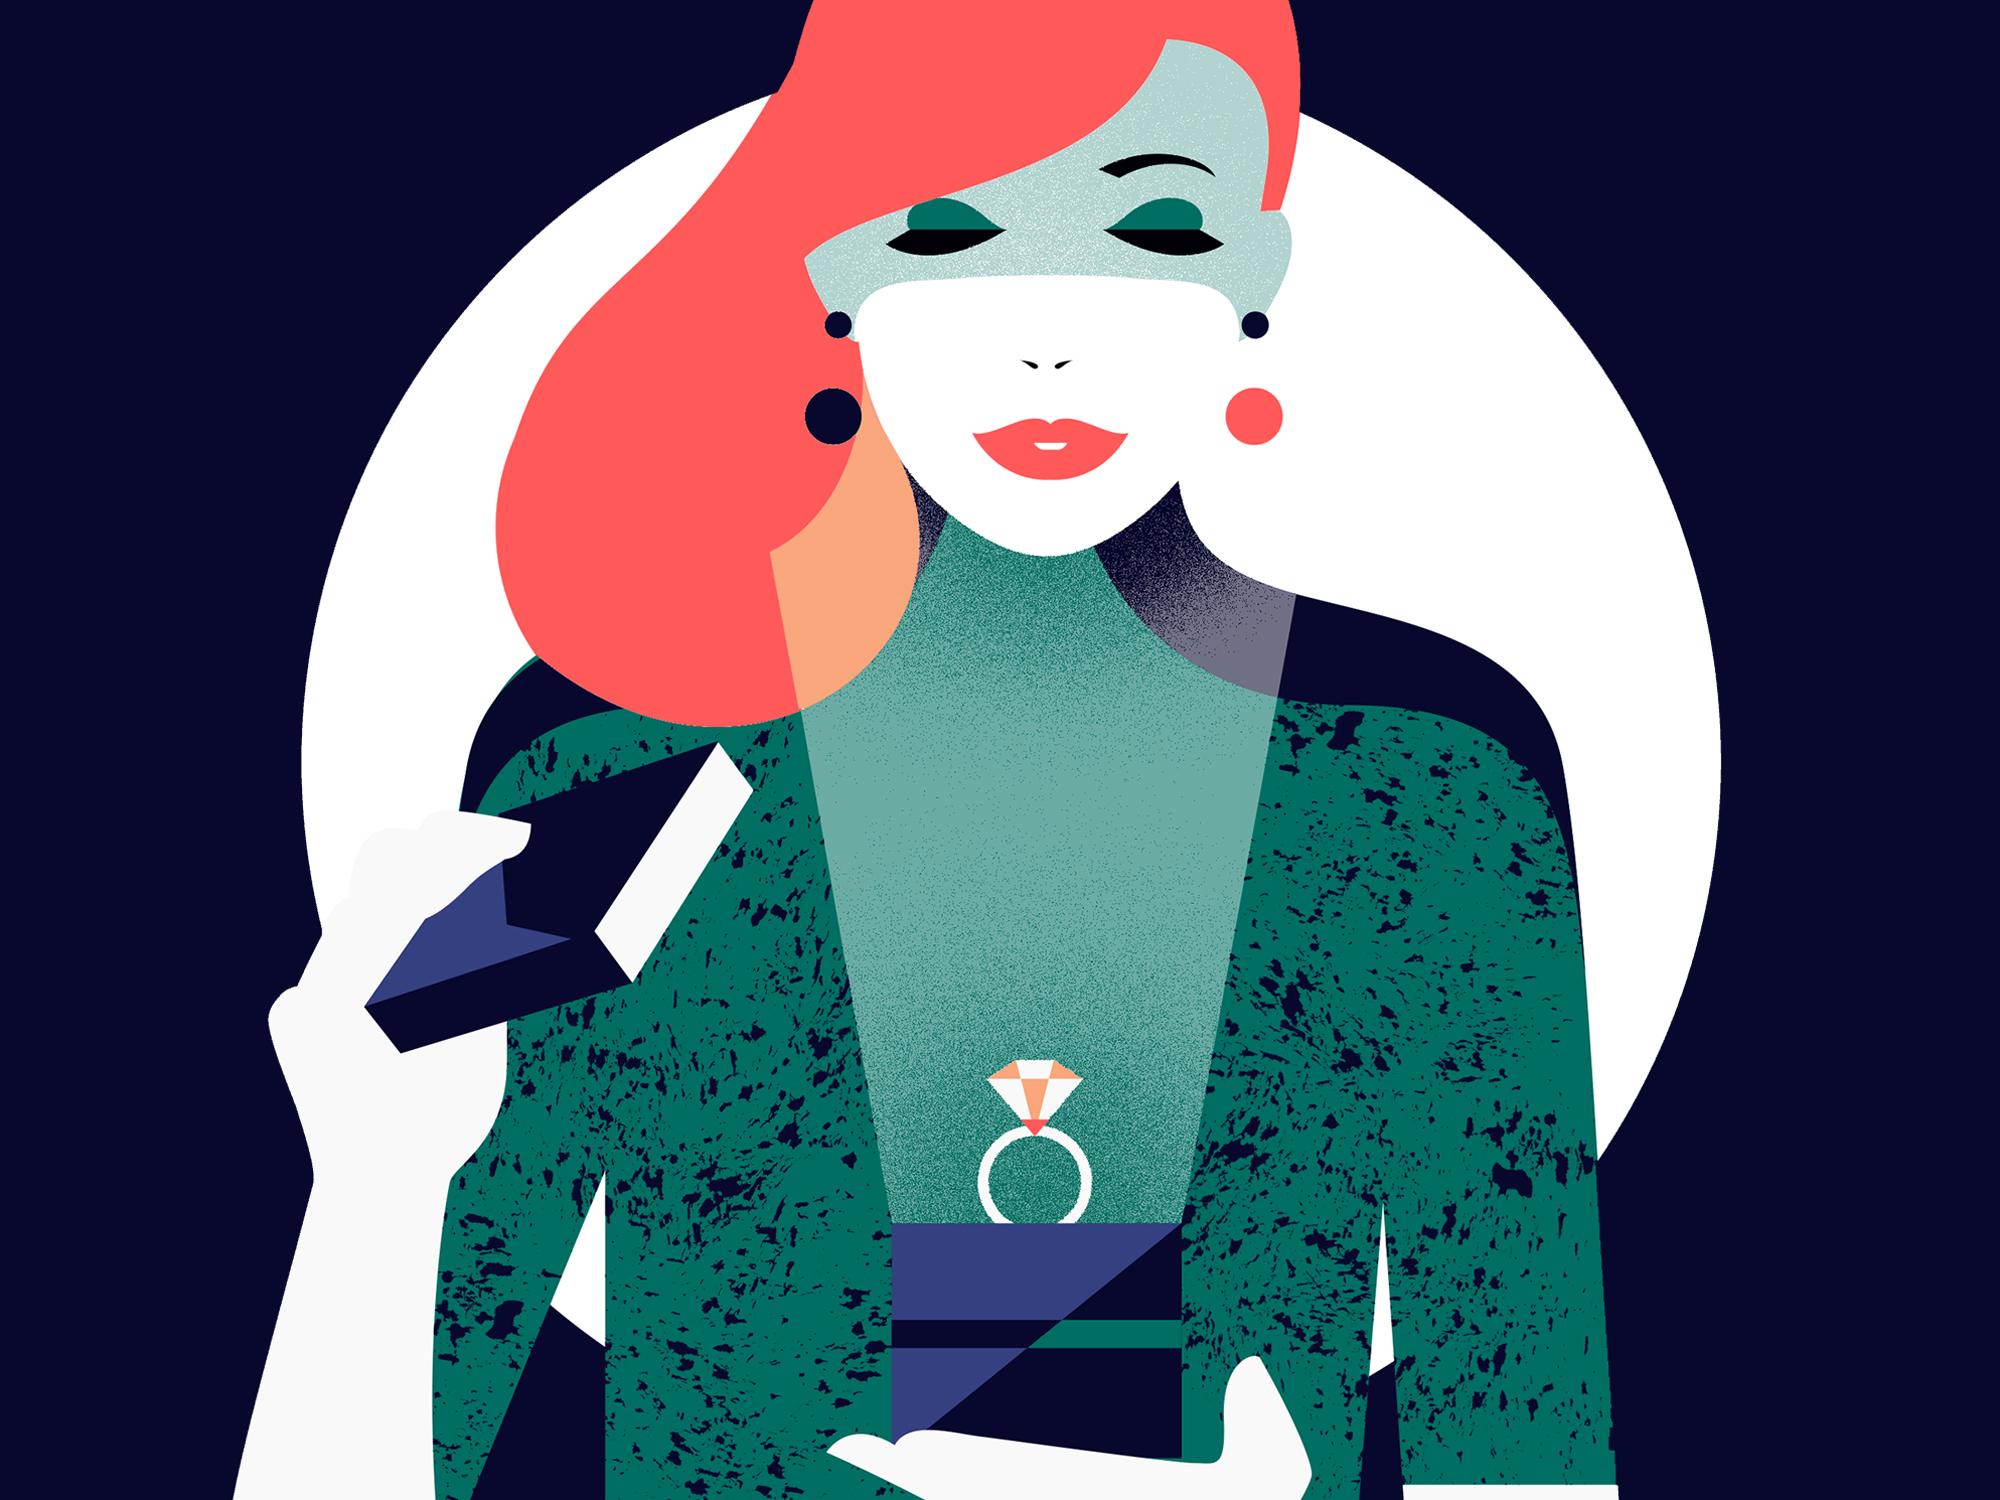 The Royal Exchange Tiffany illustration